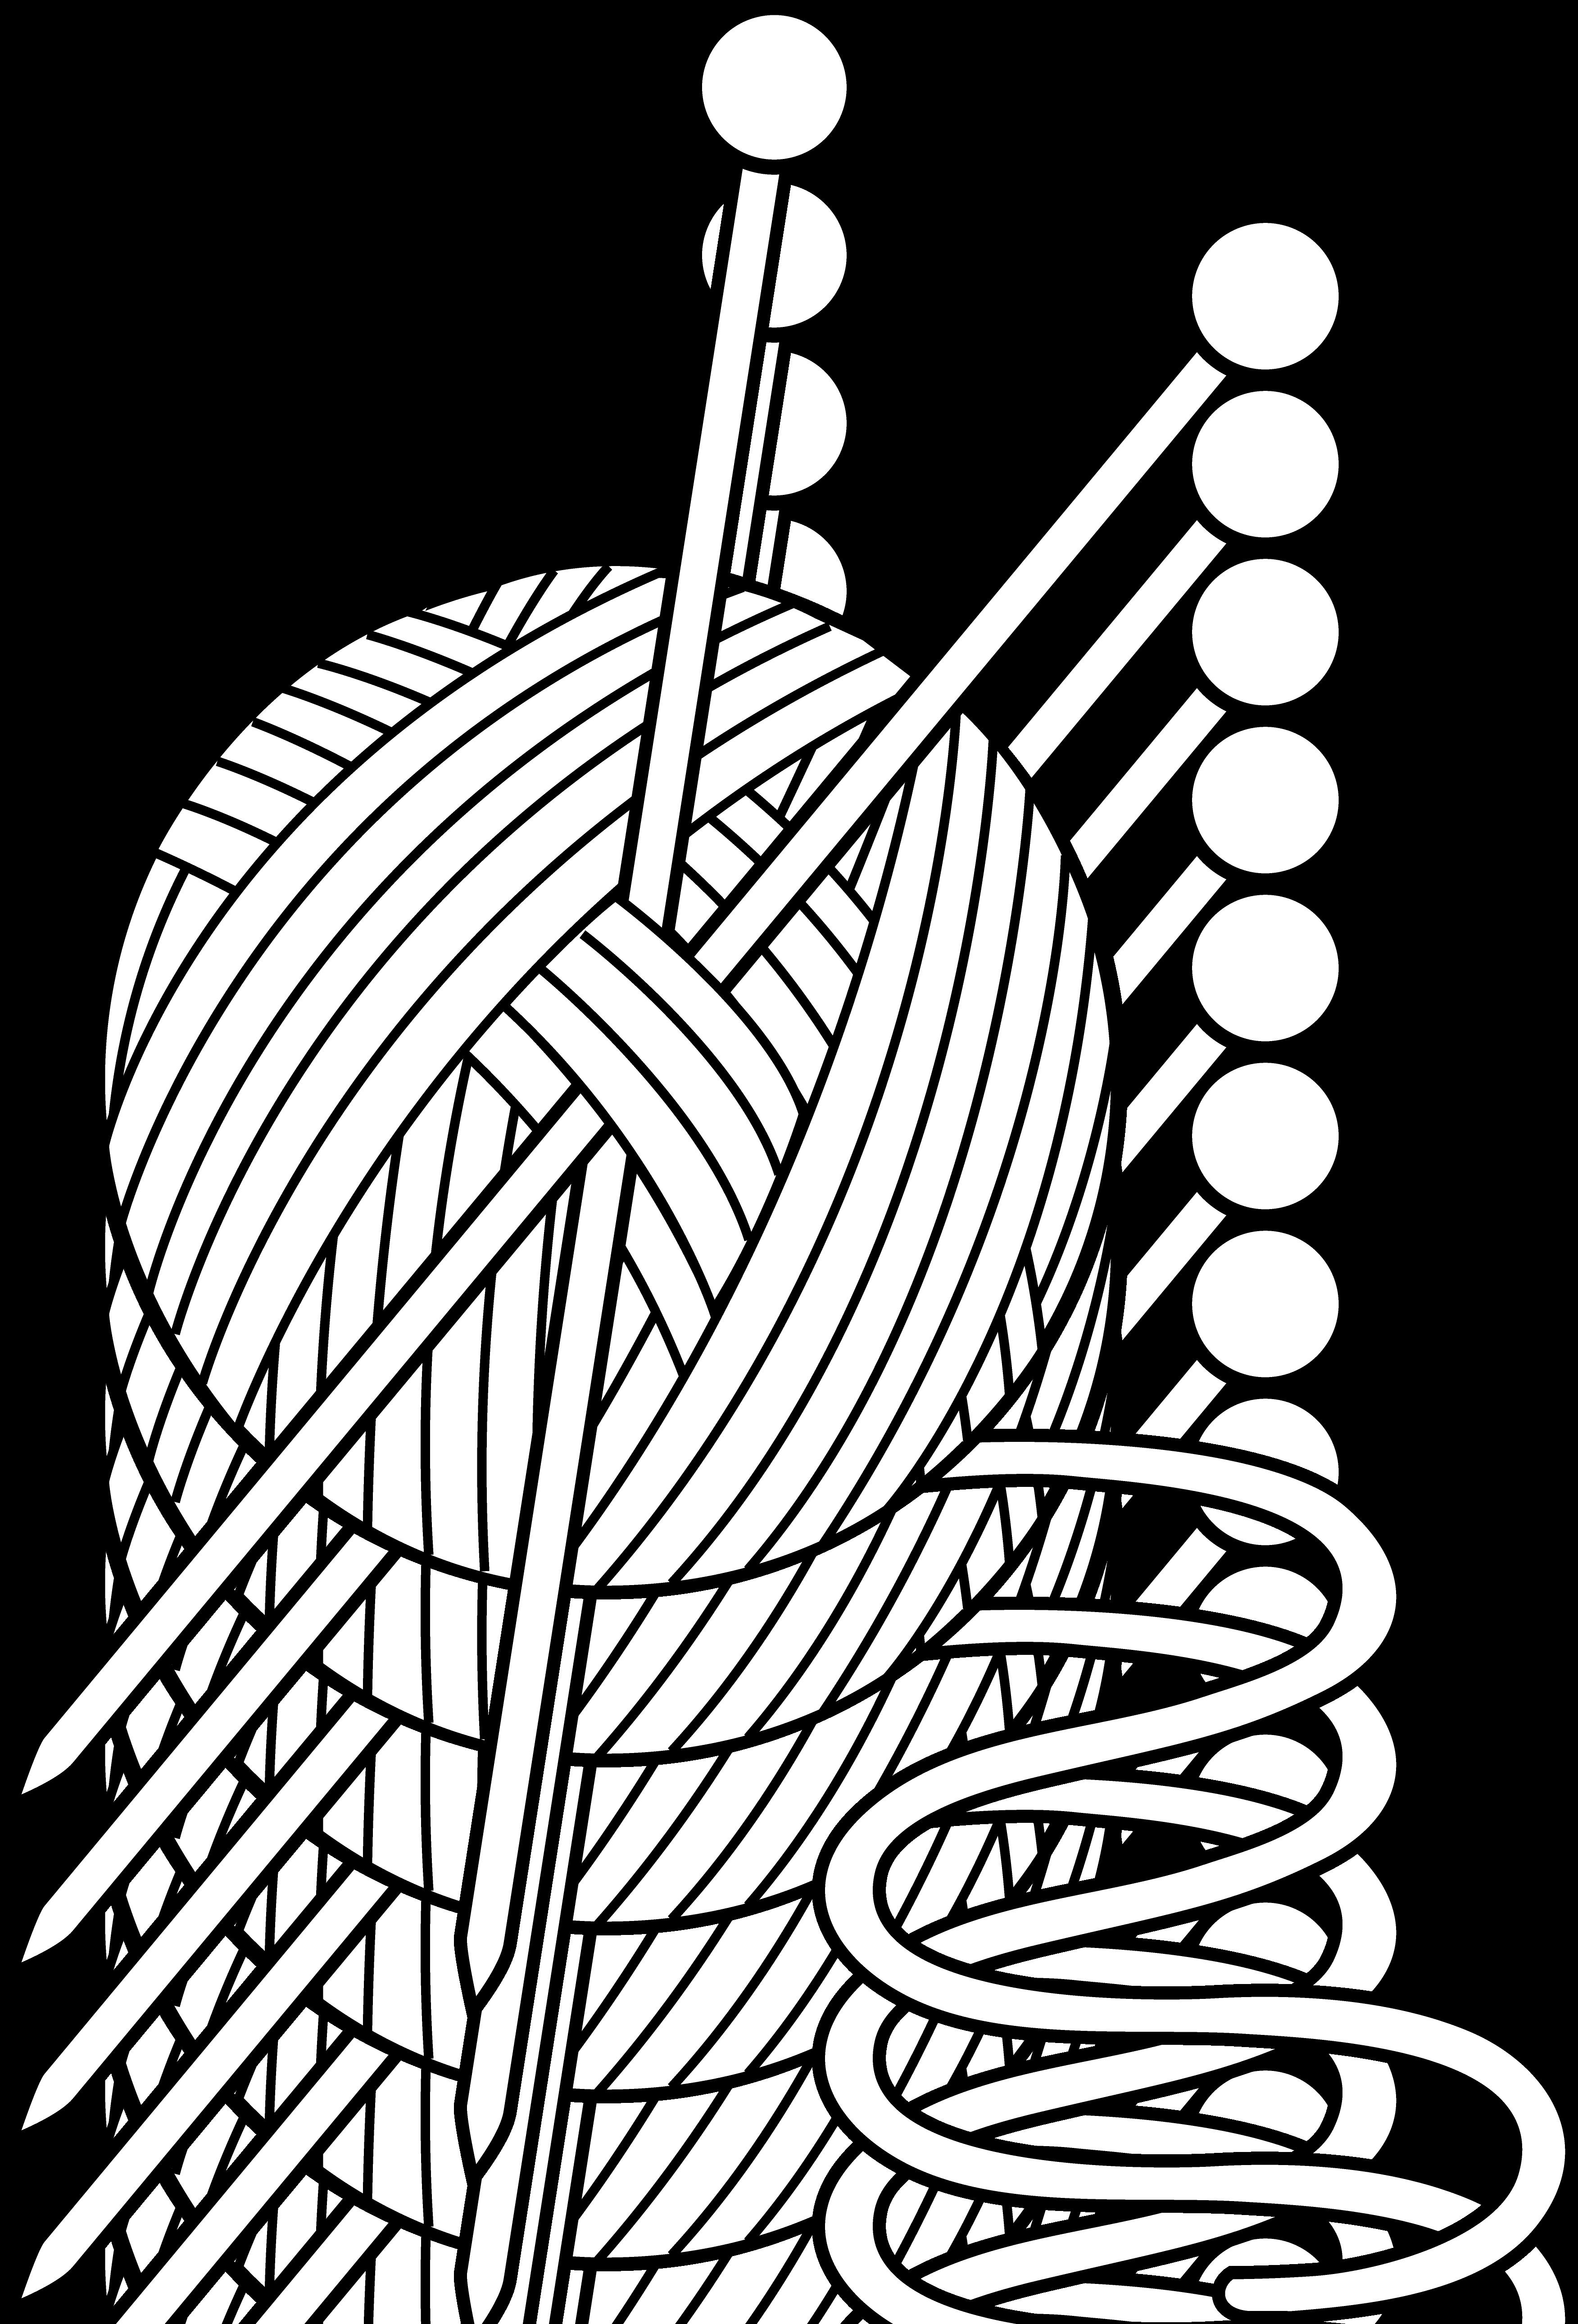 Needle Clipart-needle clipart-9